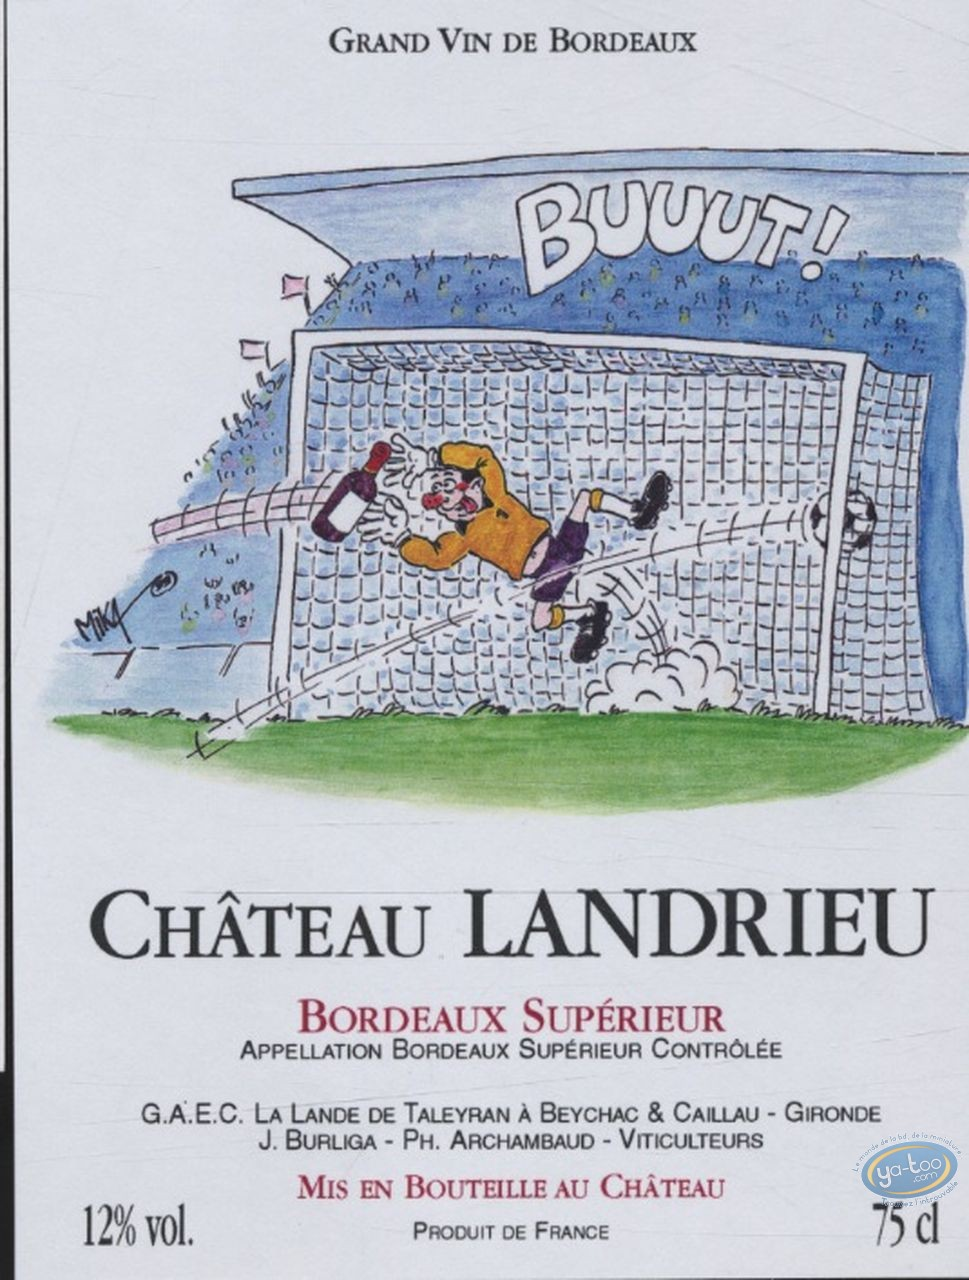 Wine Label, Buuut - Chateau Landrieu